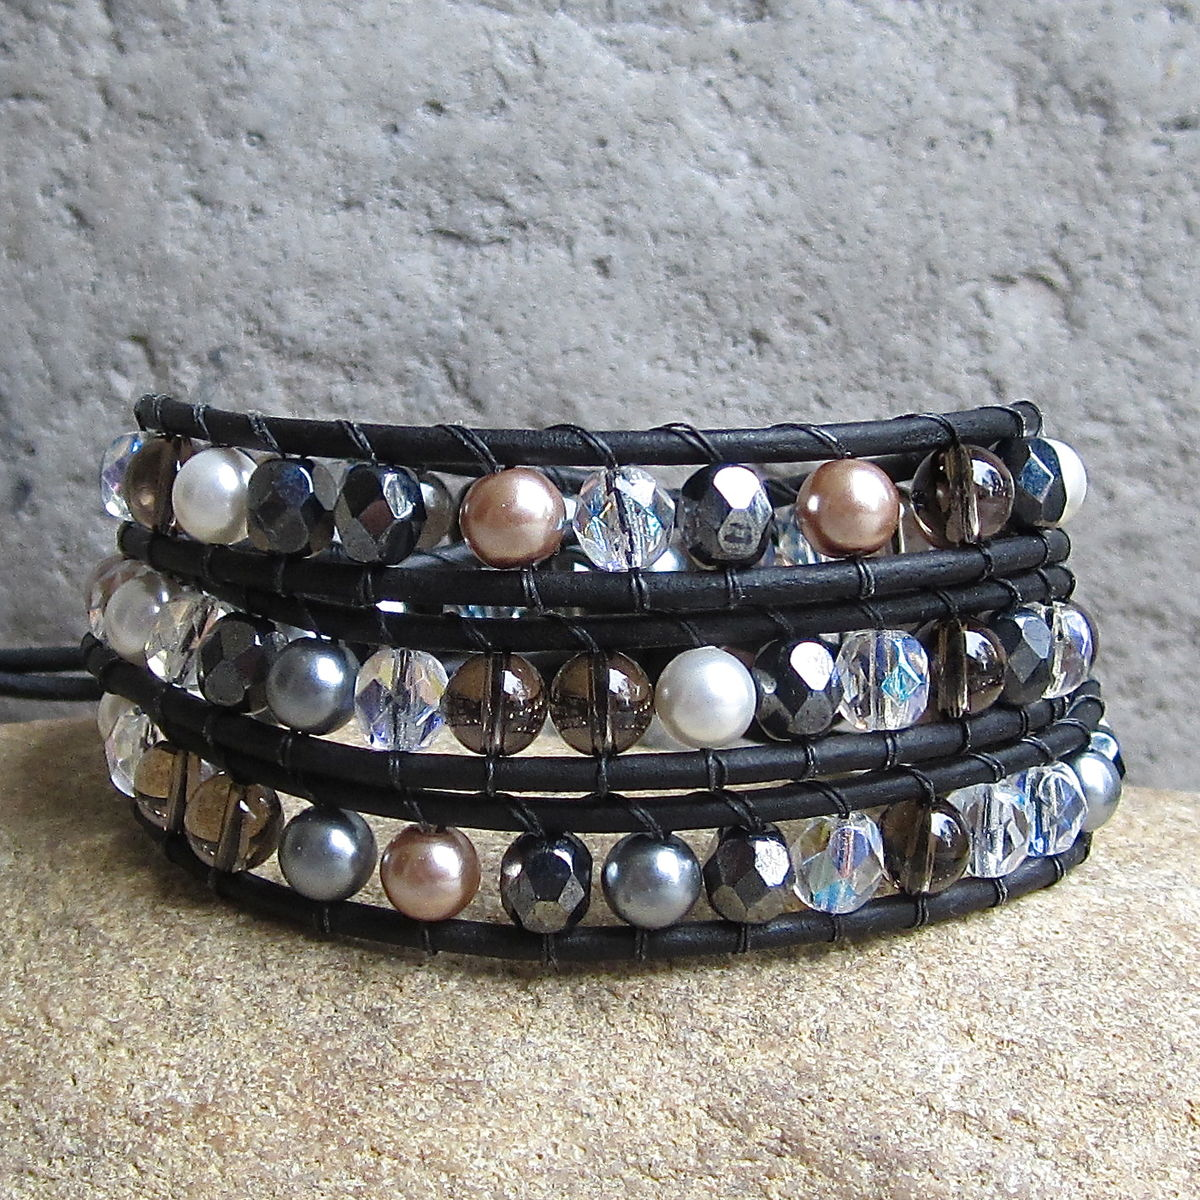 B> Neutral Sparkly Mixed Bead Black Leather 3wrap Bracelet   Town Of Beadrock